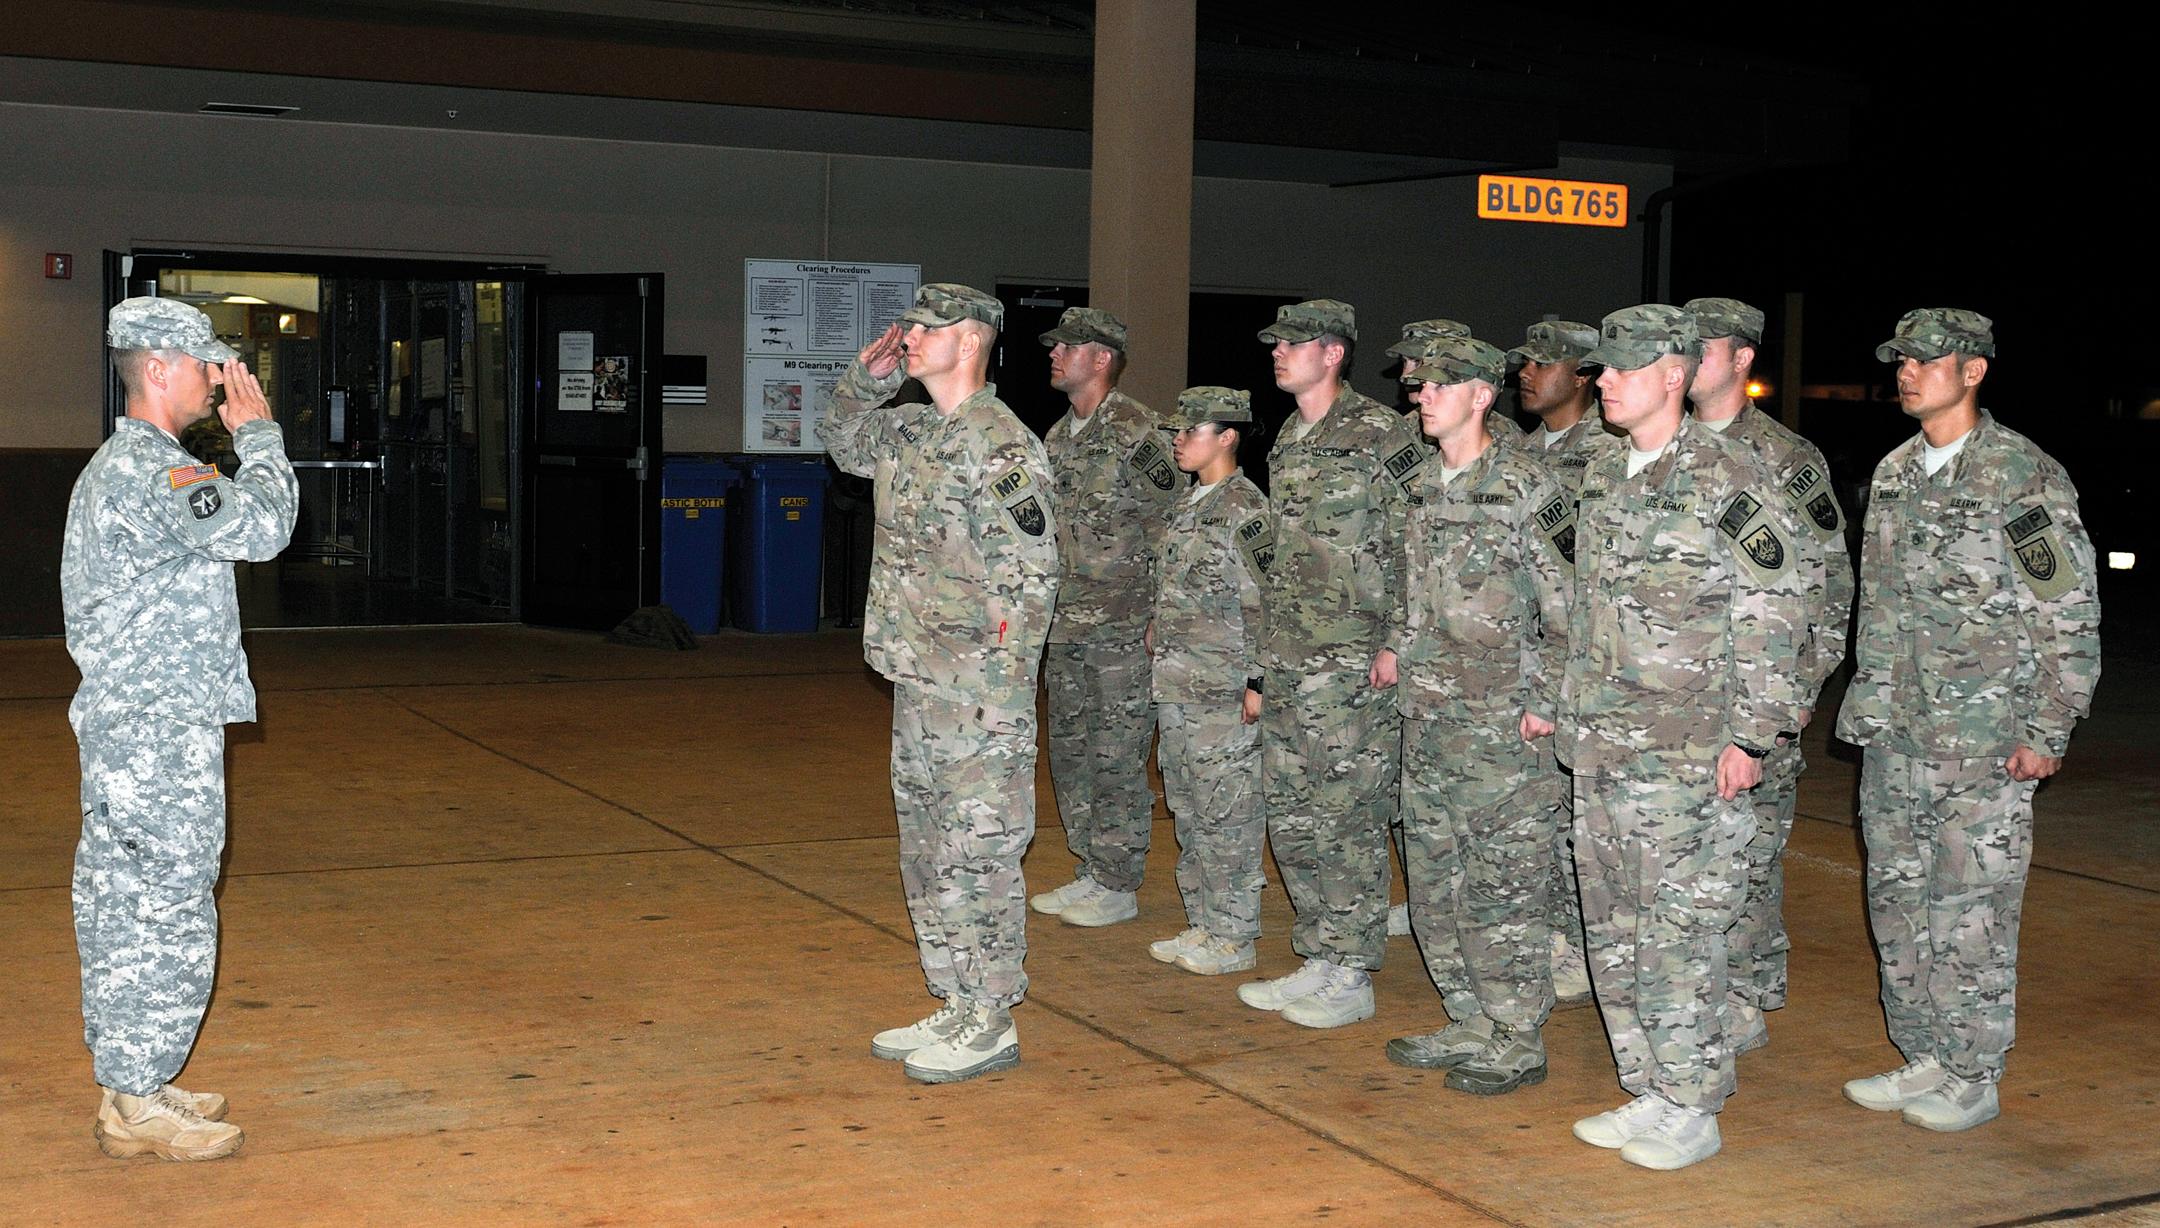 57th Military Police Company